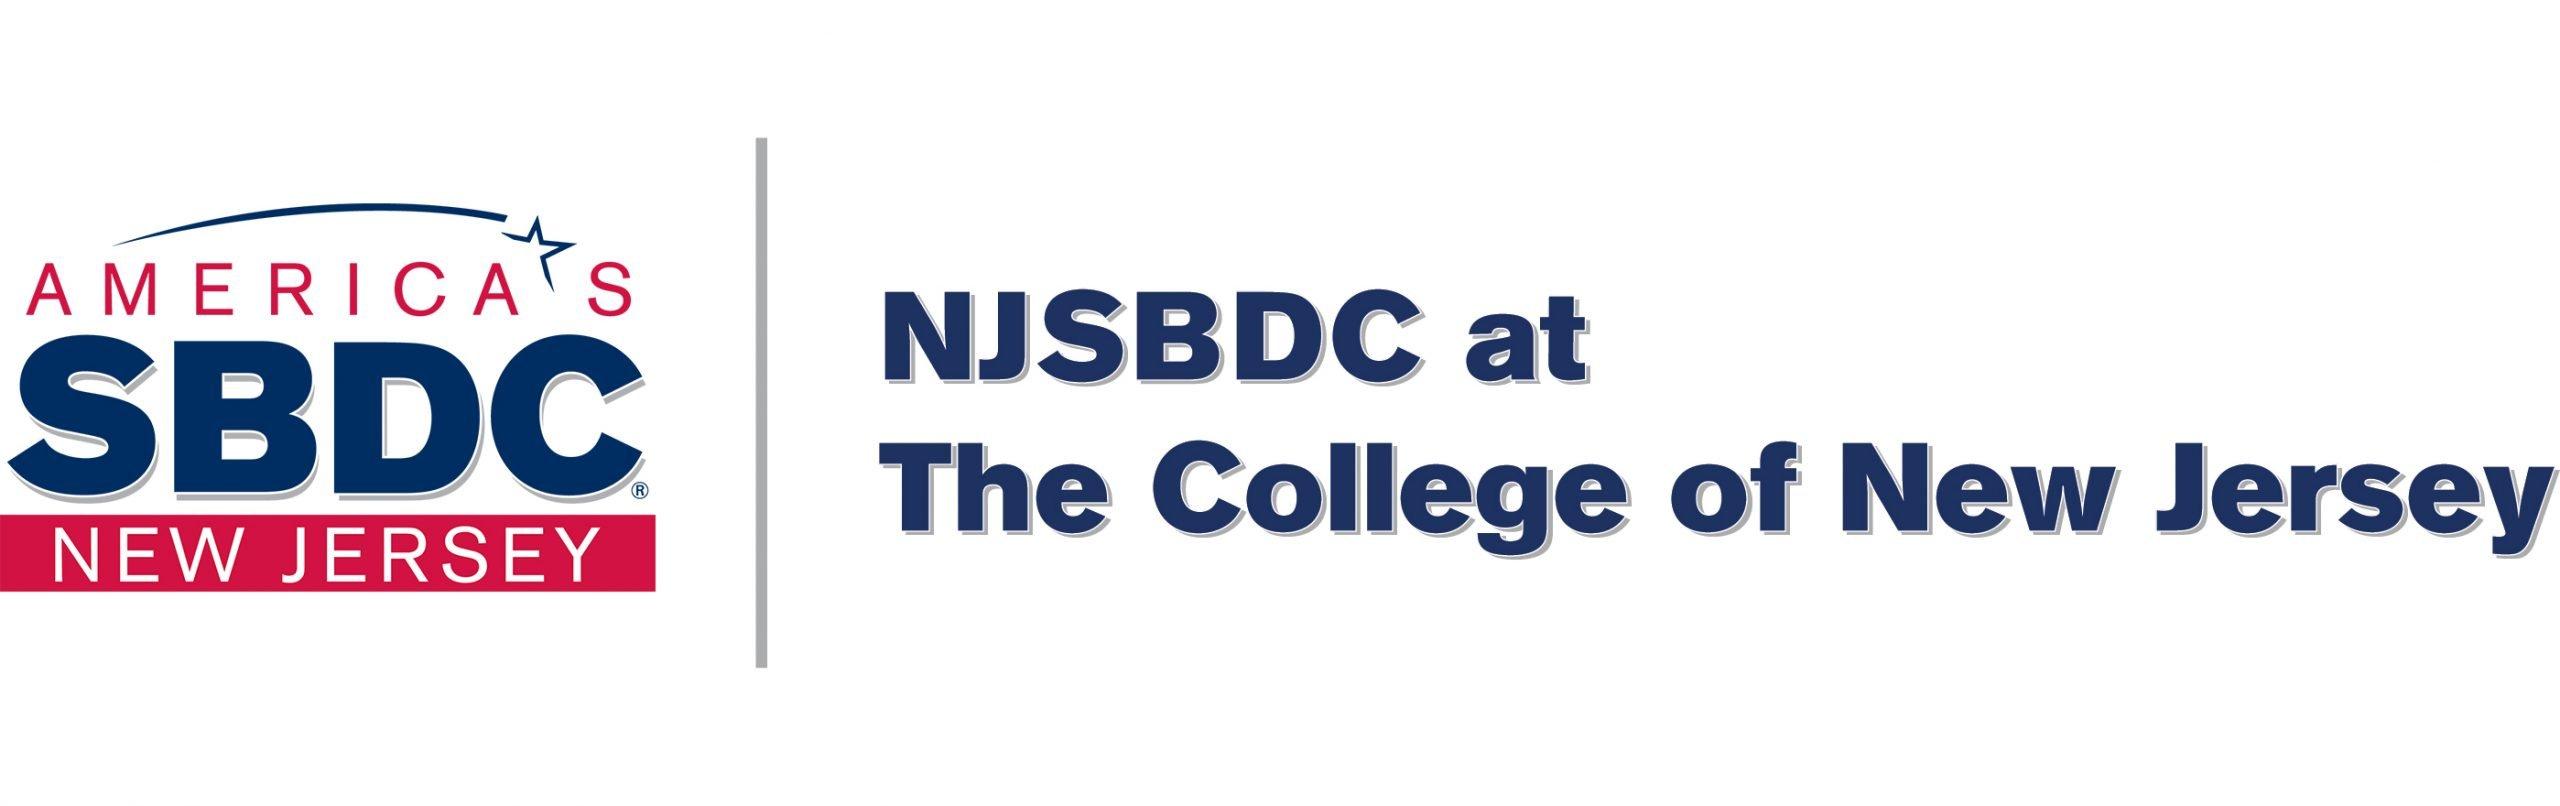 NJSBDC at TCNJ